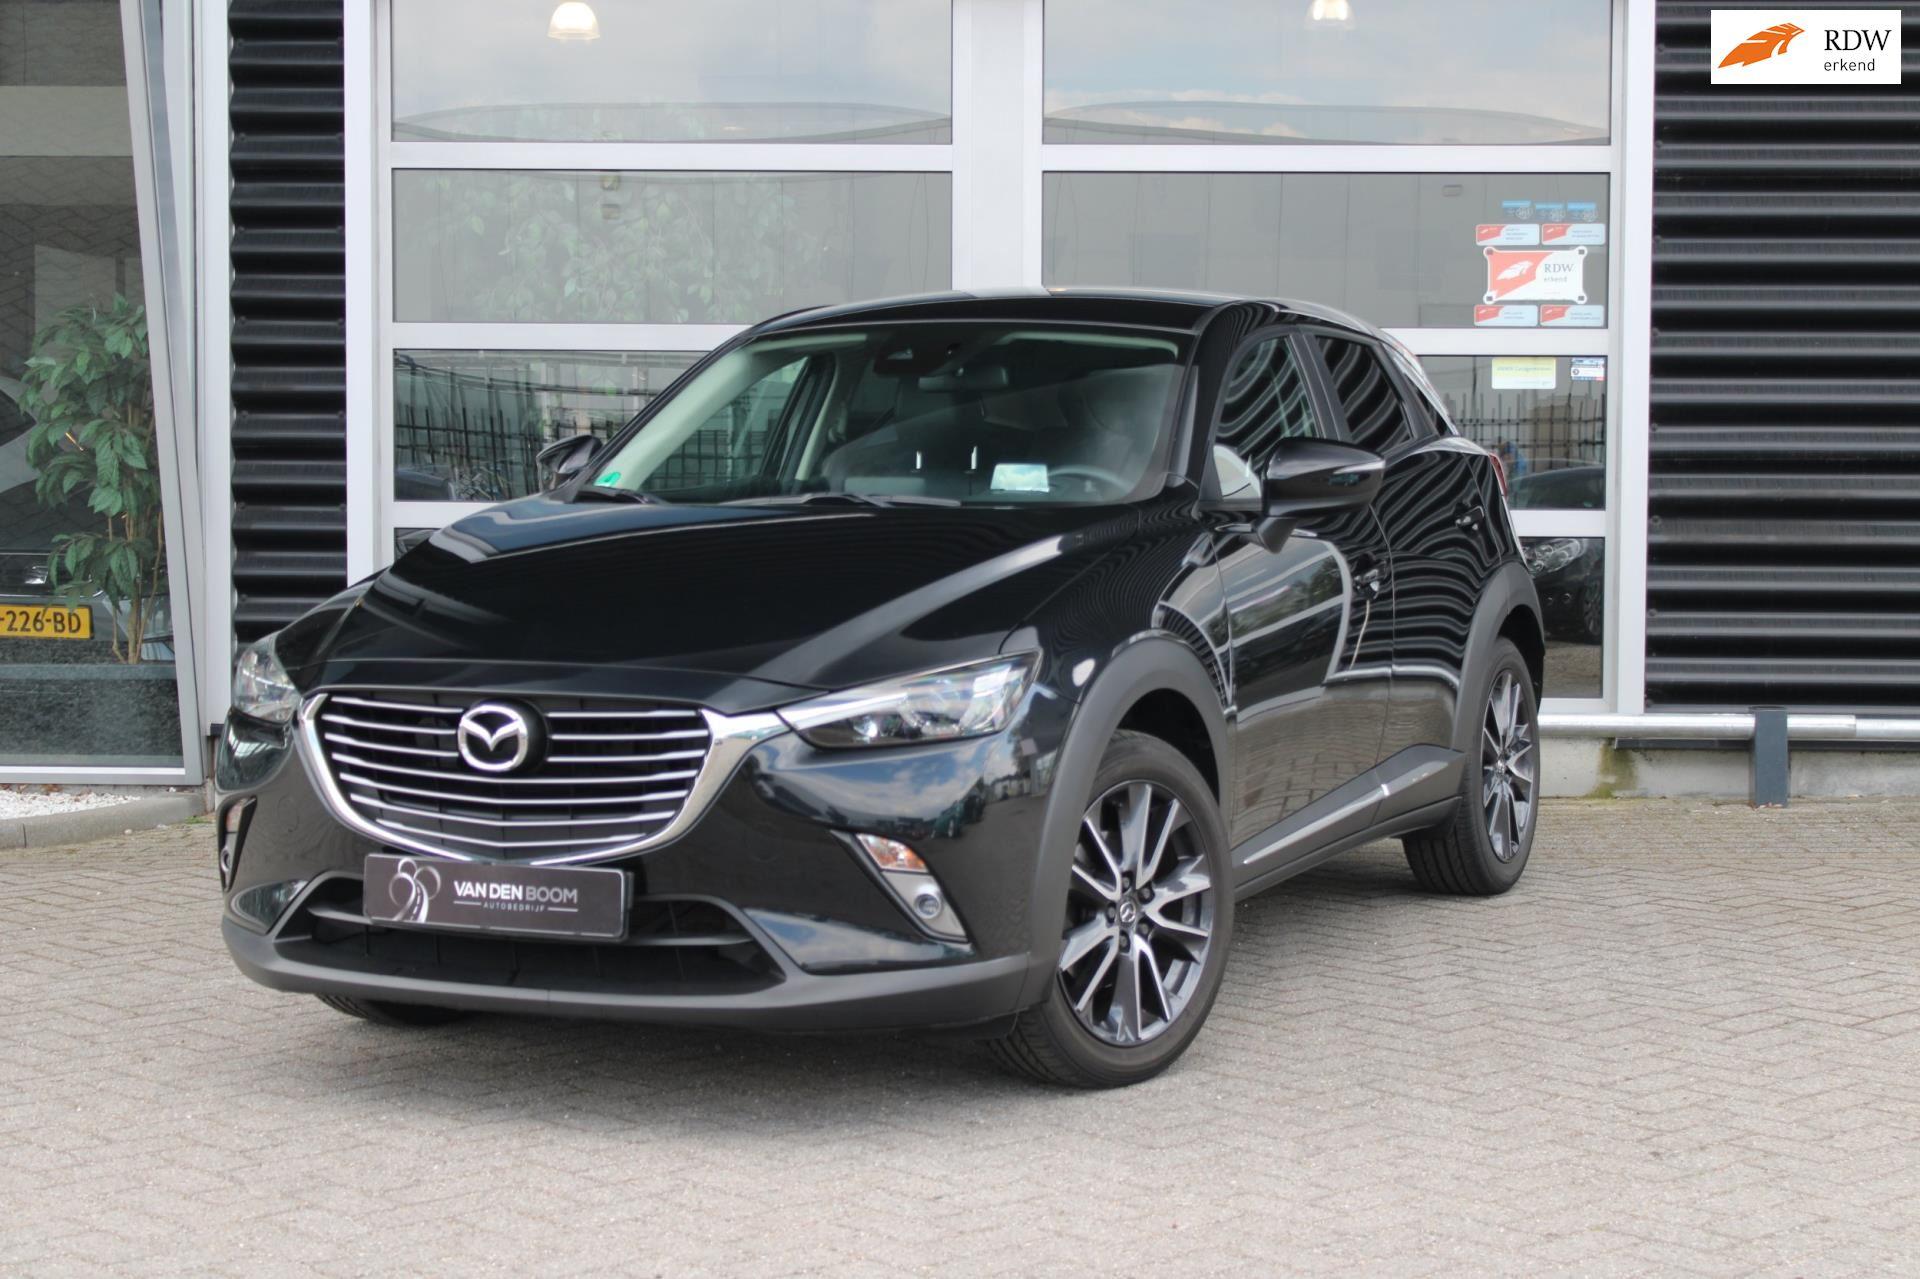 Mazda CX-3 occasion - Van den Boom Autobedrijf